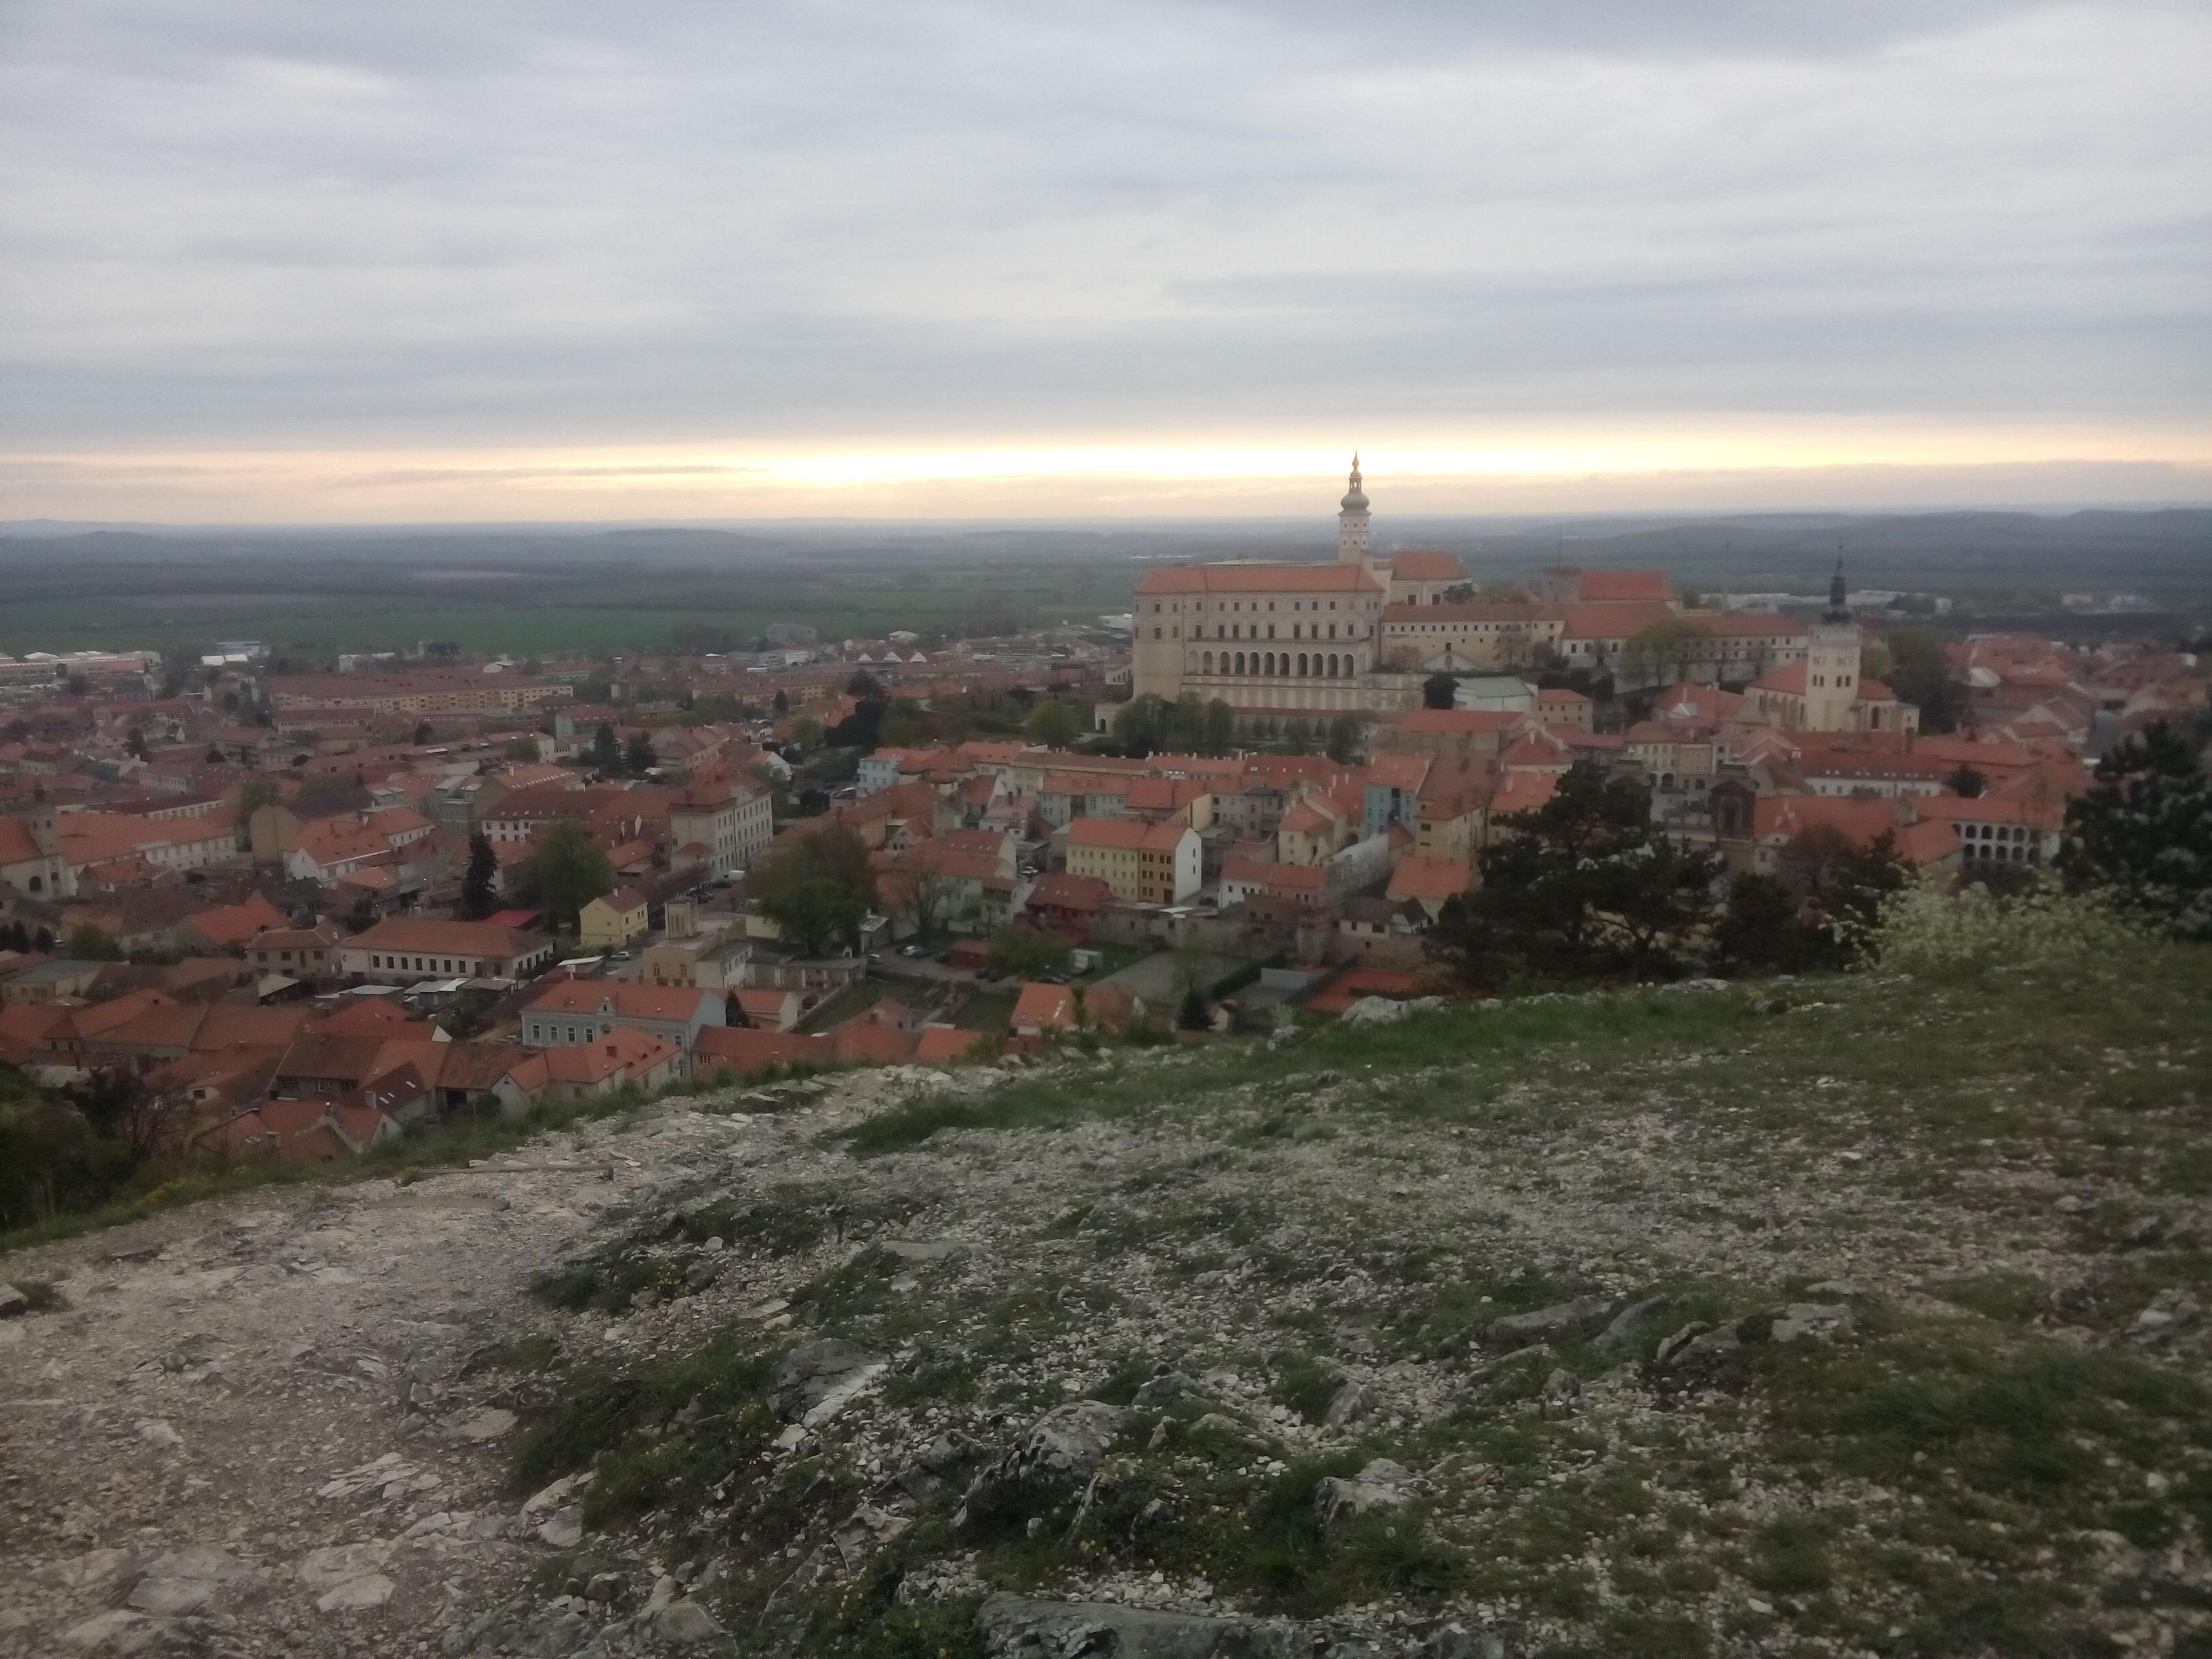 https://i.amy.gy/201804-slovakia-austria-czech/IMG_20180416_184321.jpg